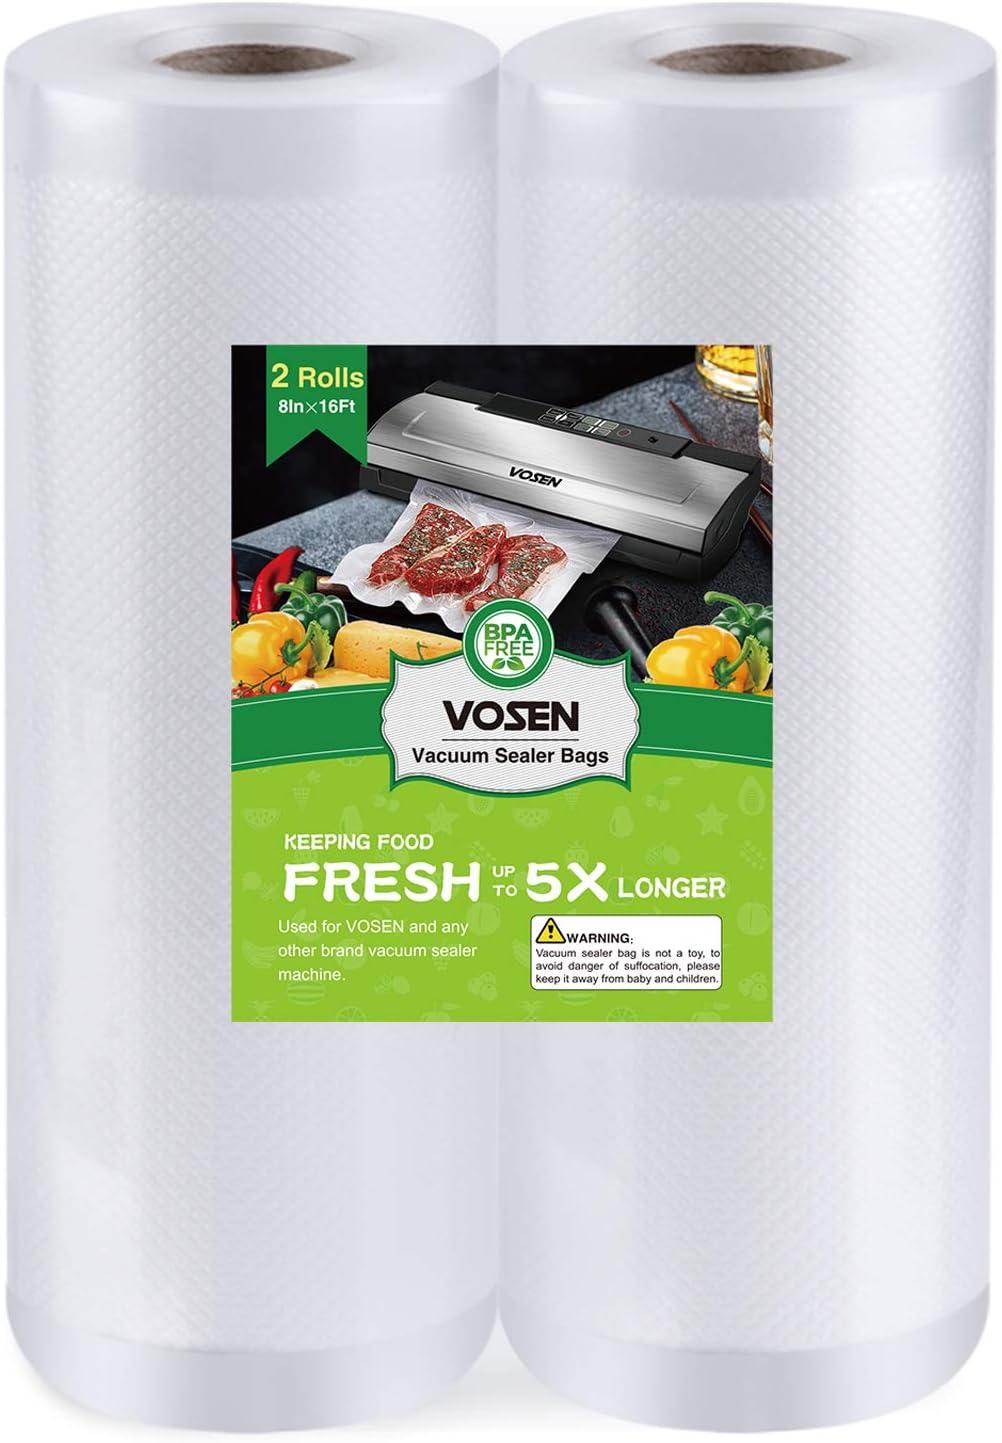 VOSEN Vacuum Sealer Bags Rolls-2 Pack 8''x 16' BPA Free Heavy Duty Vacuum Sealer Sous Vide Bags Commercial Grade Bag for Food Saver